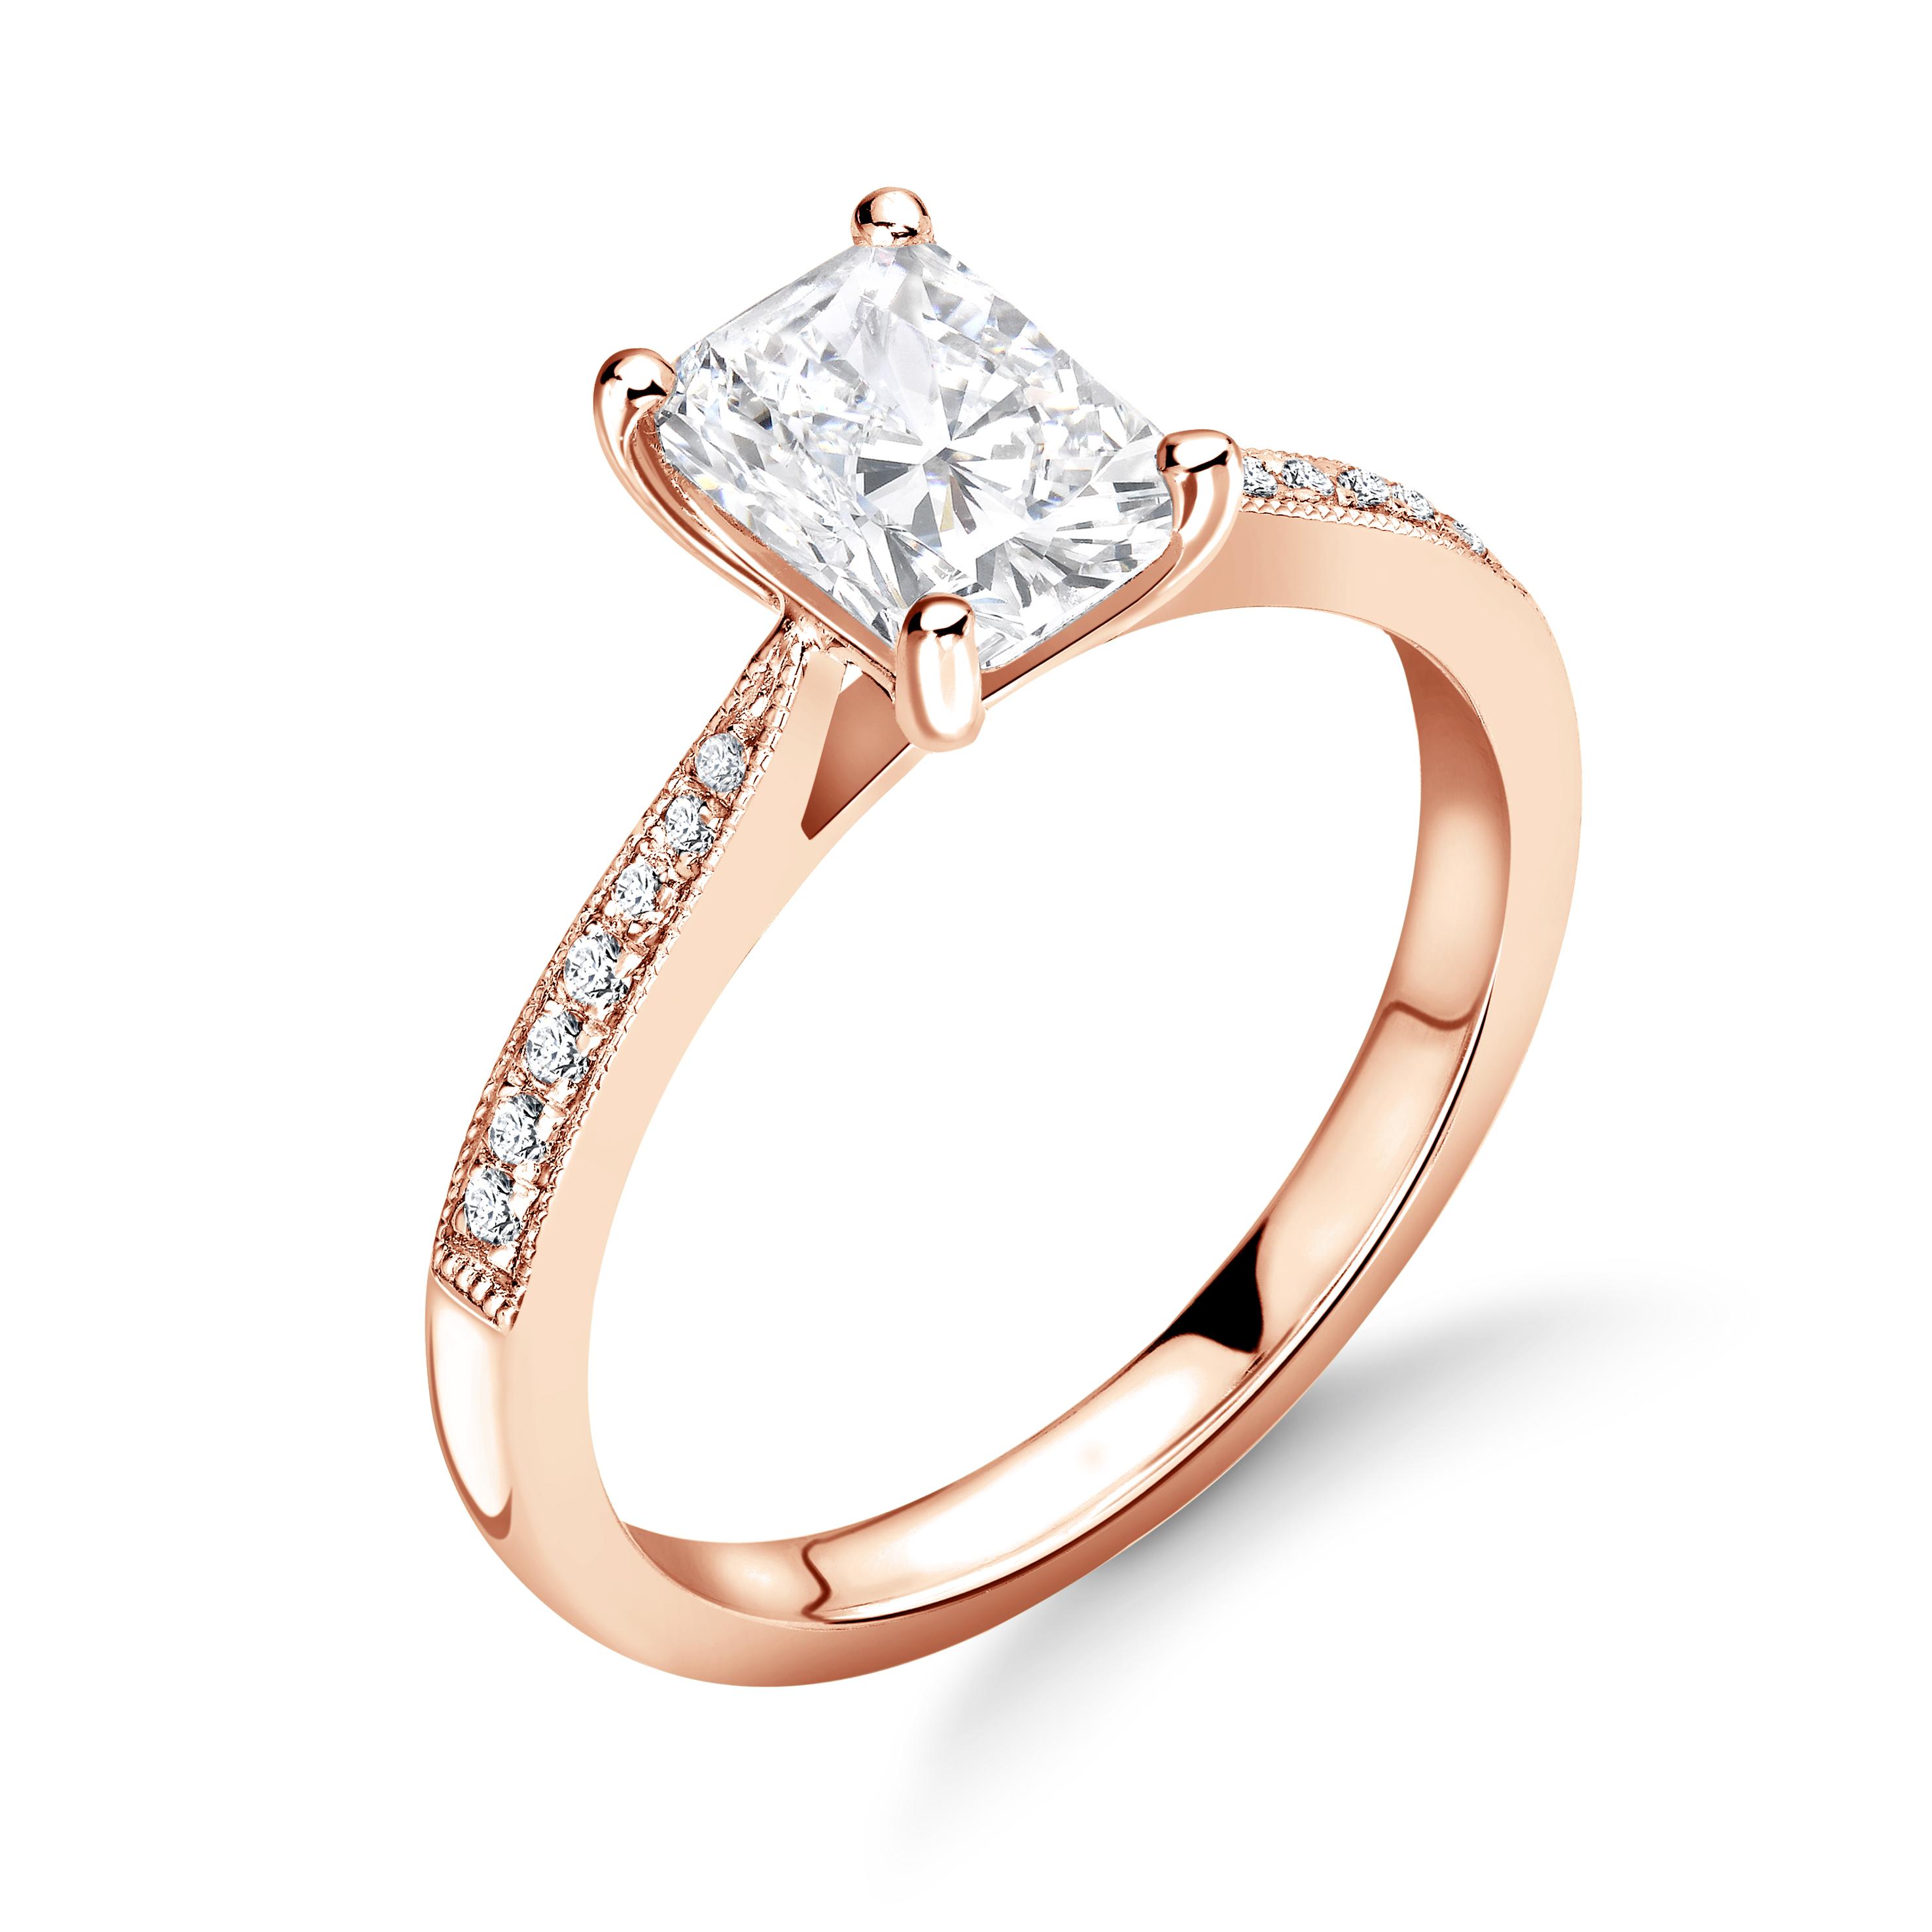 Radiant Cut Milligrain Edge Shoulder Set Diamond Engagement Ring